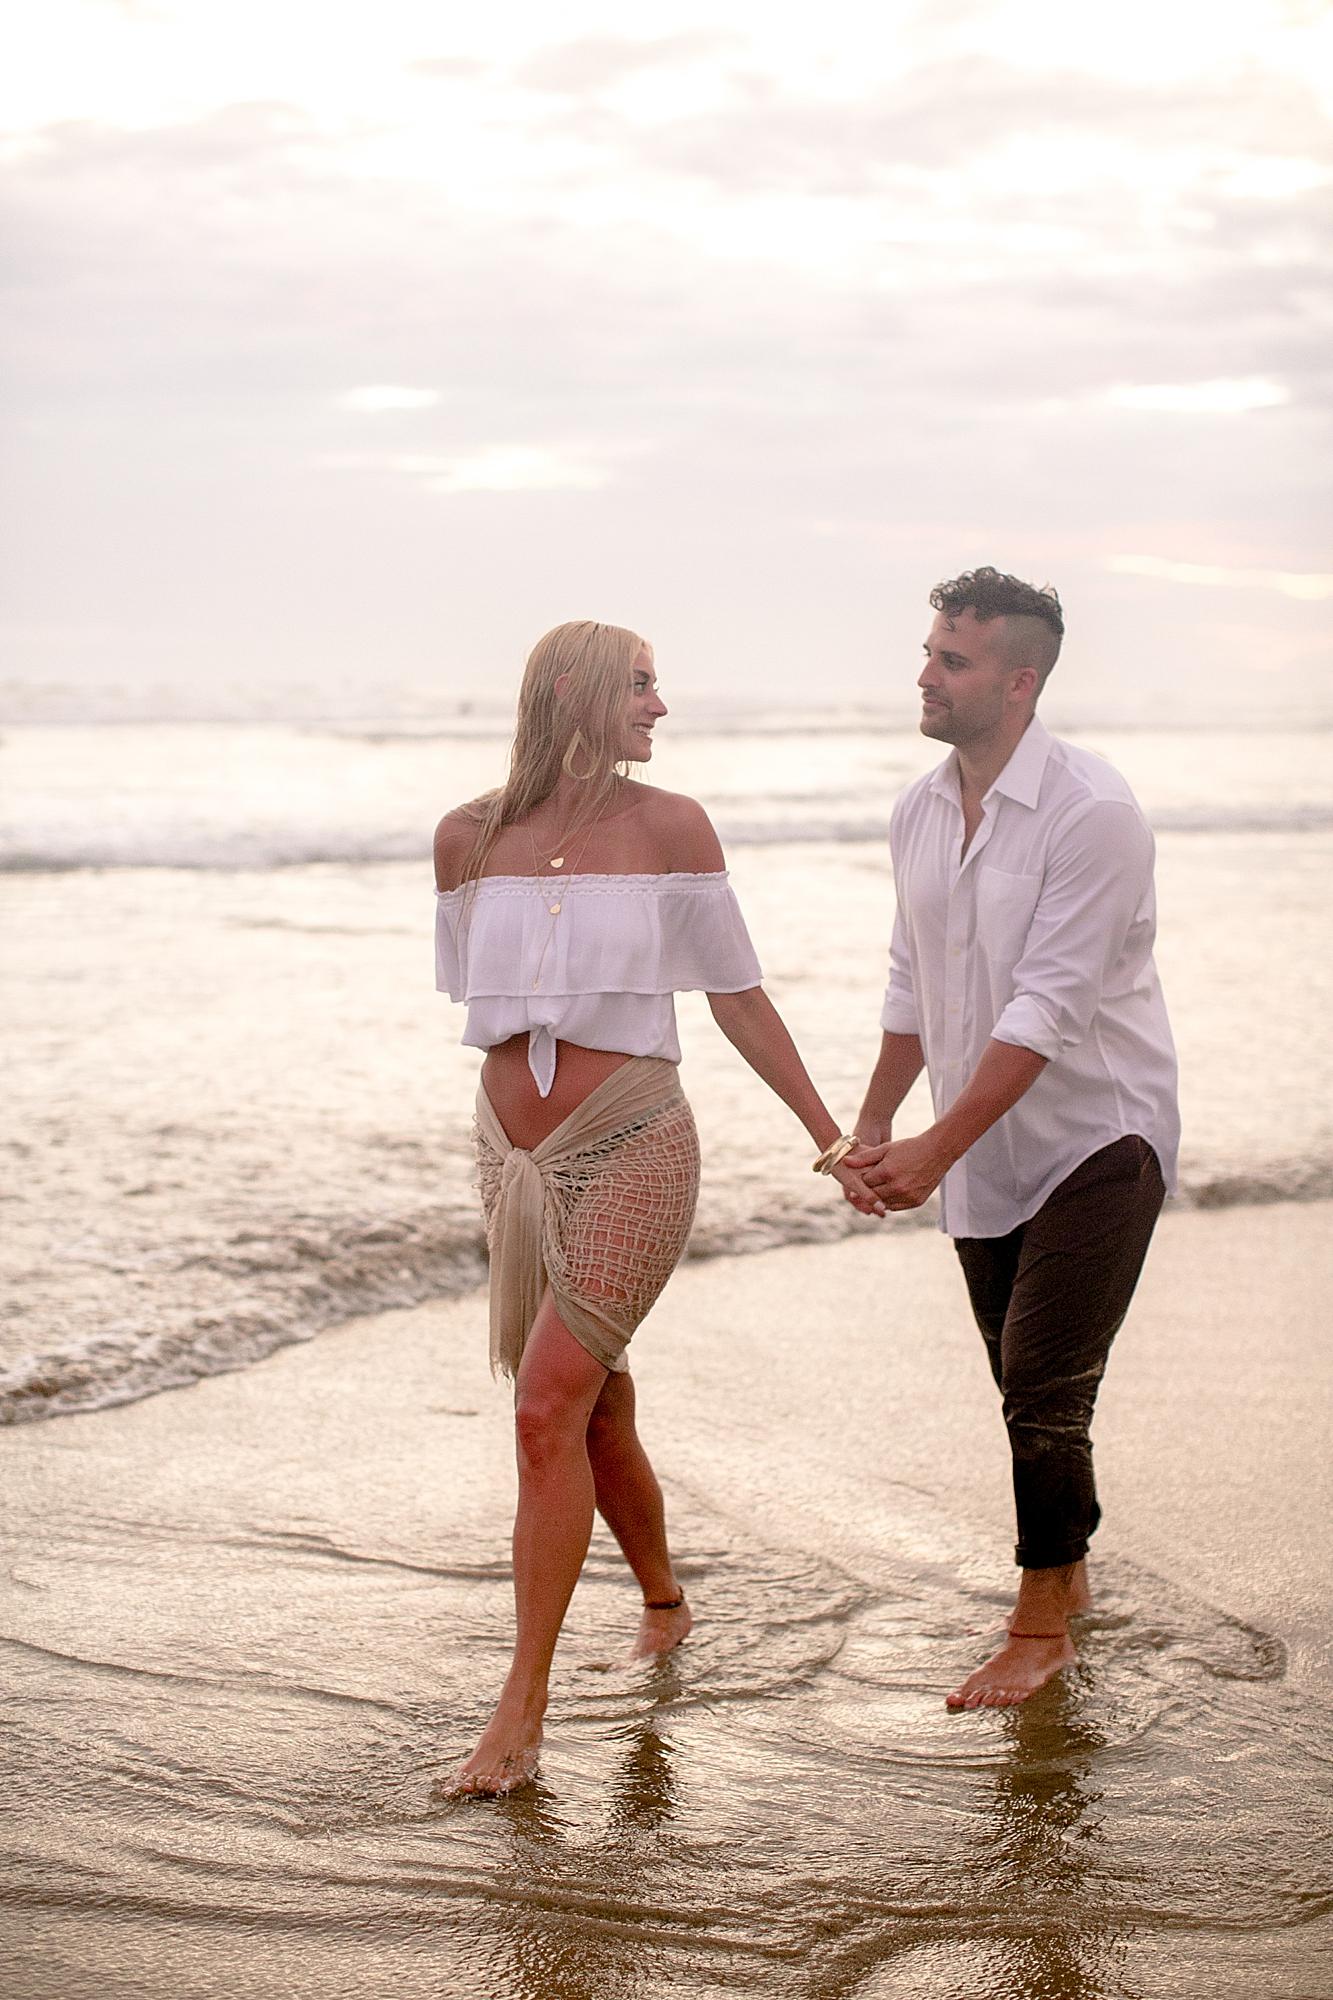 Epic and Adventurous Travel Wedding and Portrait Photographer in Nosara, Costa Rica - Kelee Bovelle @xokelee @keleeb - 18.jpg